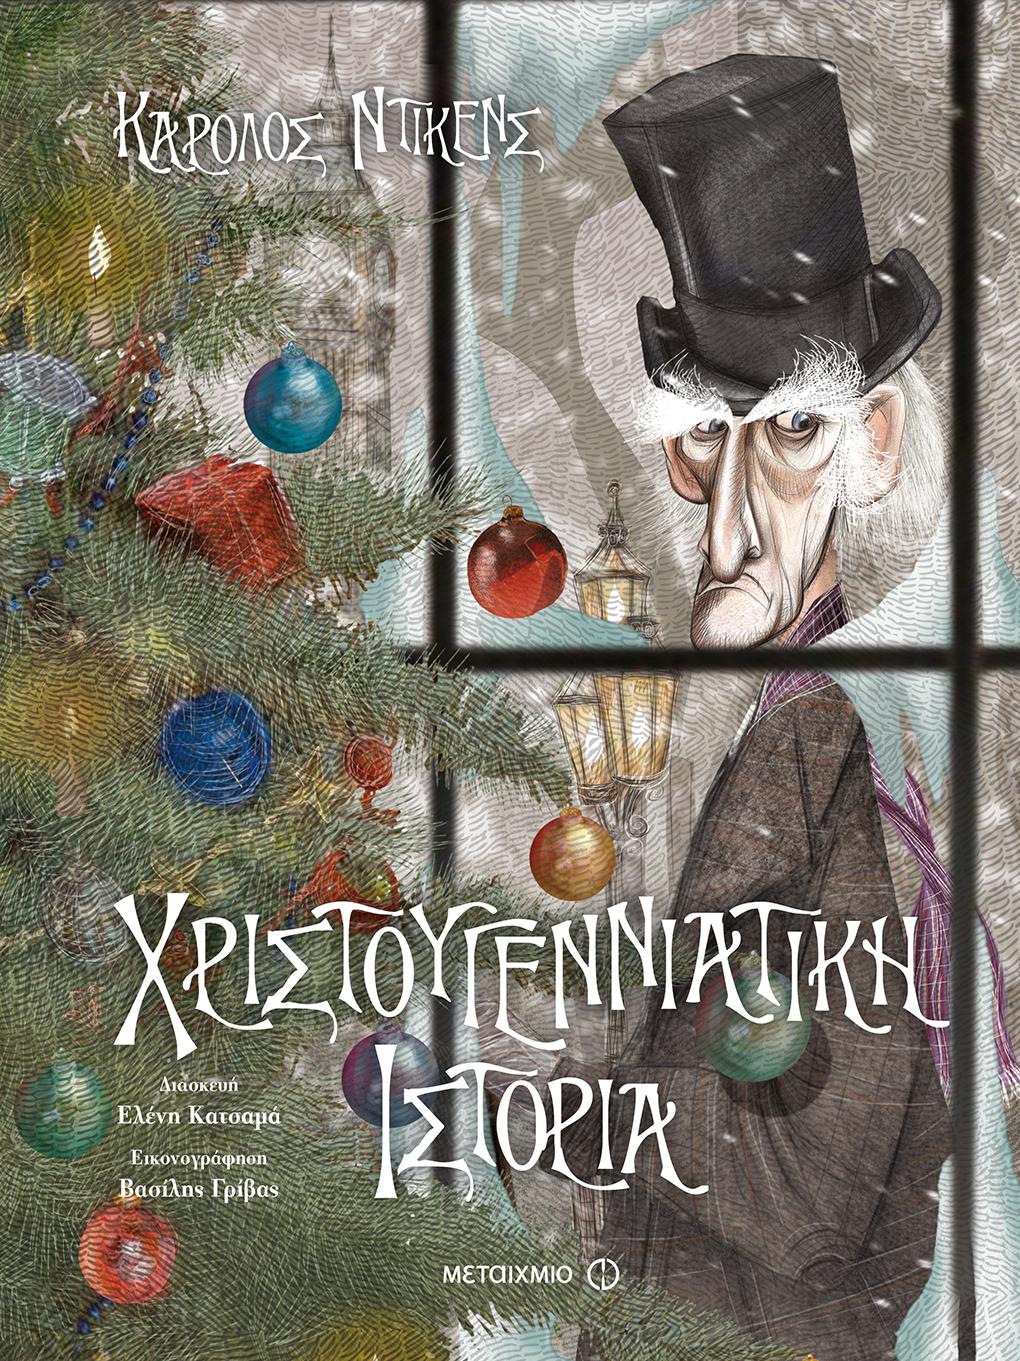 82e45f583a Χριστουγεννιάτικη ιστορία (Εκδόσεις Μεταίχμιο)  Αδιάφορος για τα  Χριστούγεννα και σκληρός με όλους